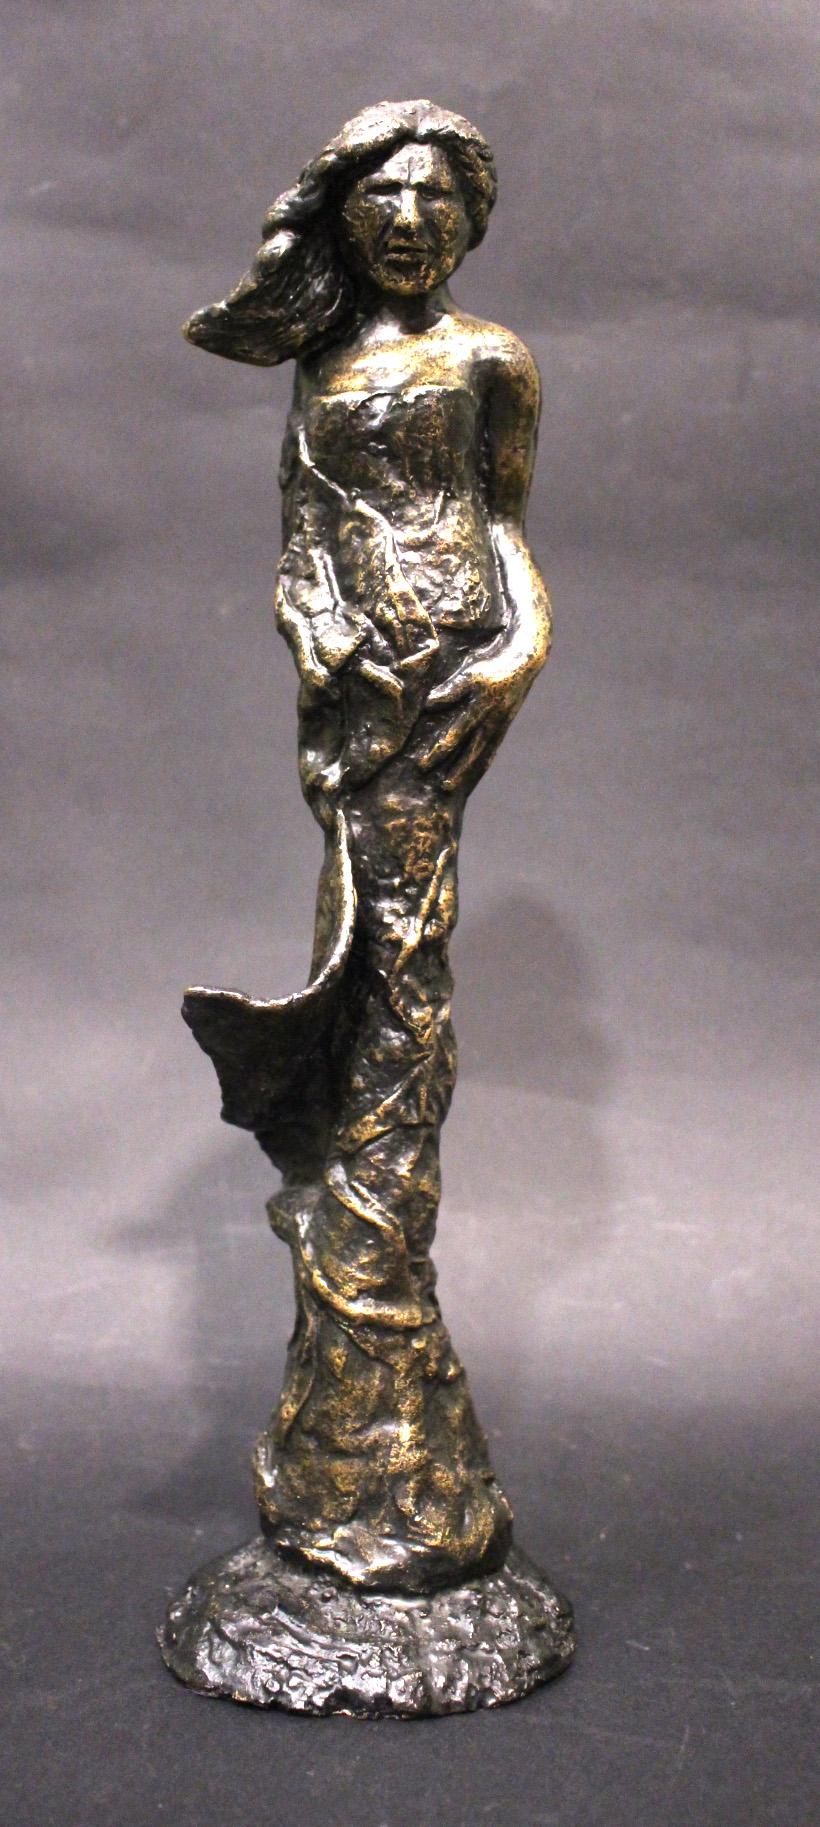 "Lot 59 - ALISON DUCKER, (Irish b.1963) ""CONTEMPLATION"", bronze sculpture, signed, 13.5"" high approx (Unique)"